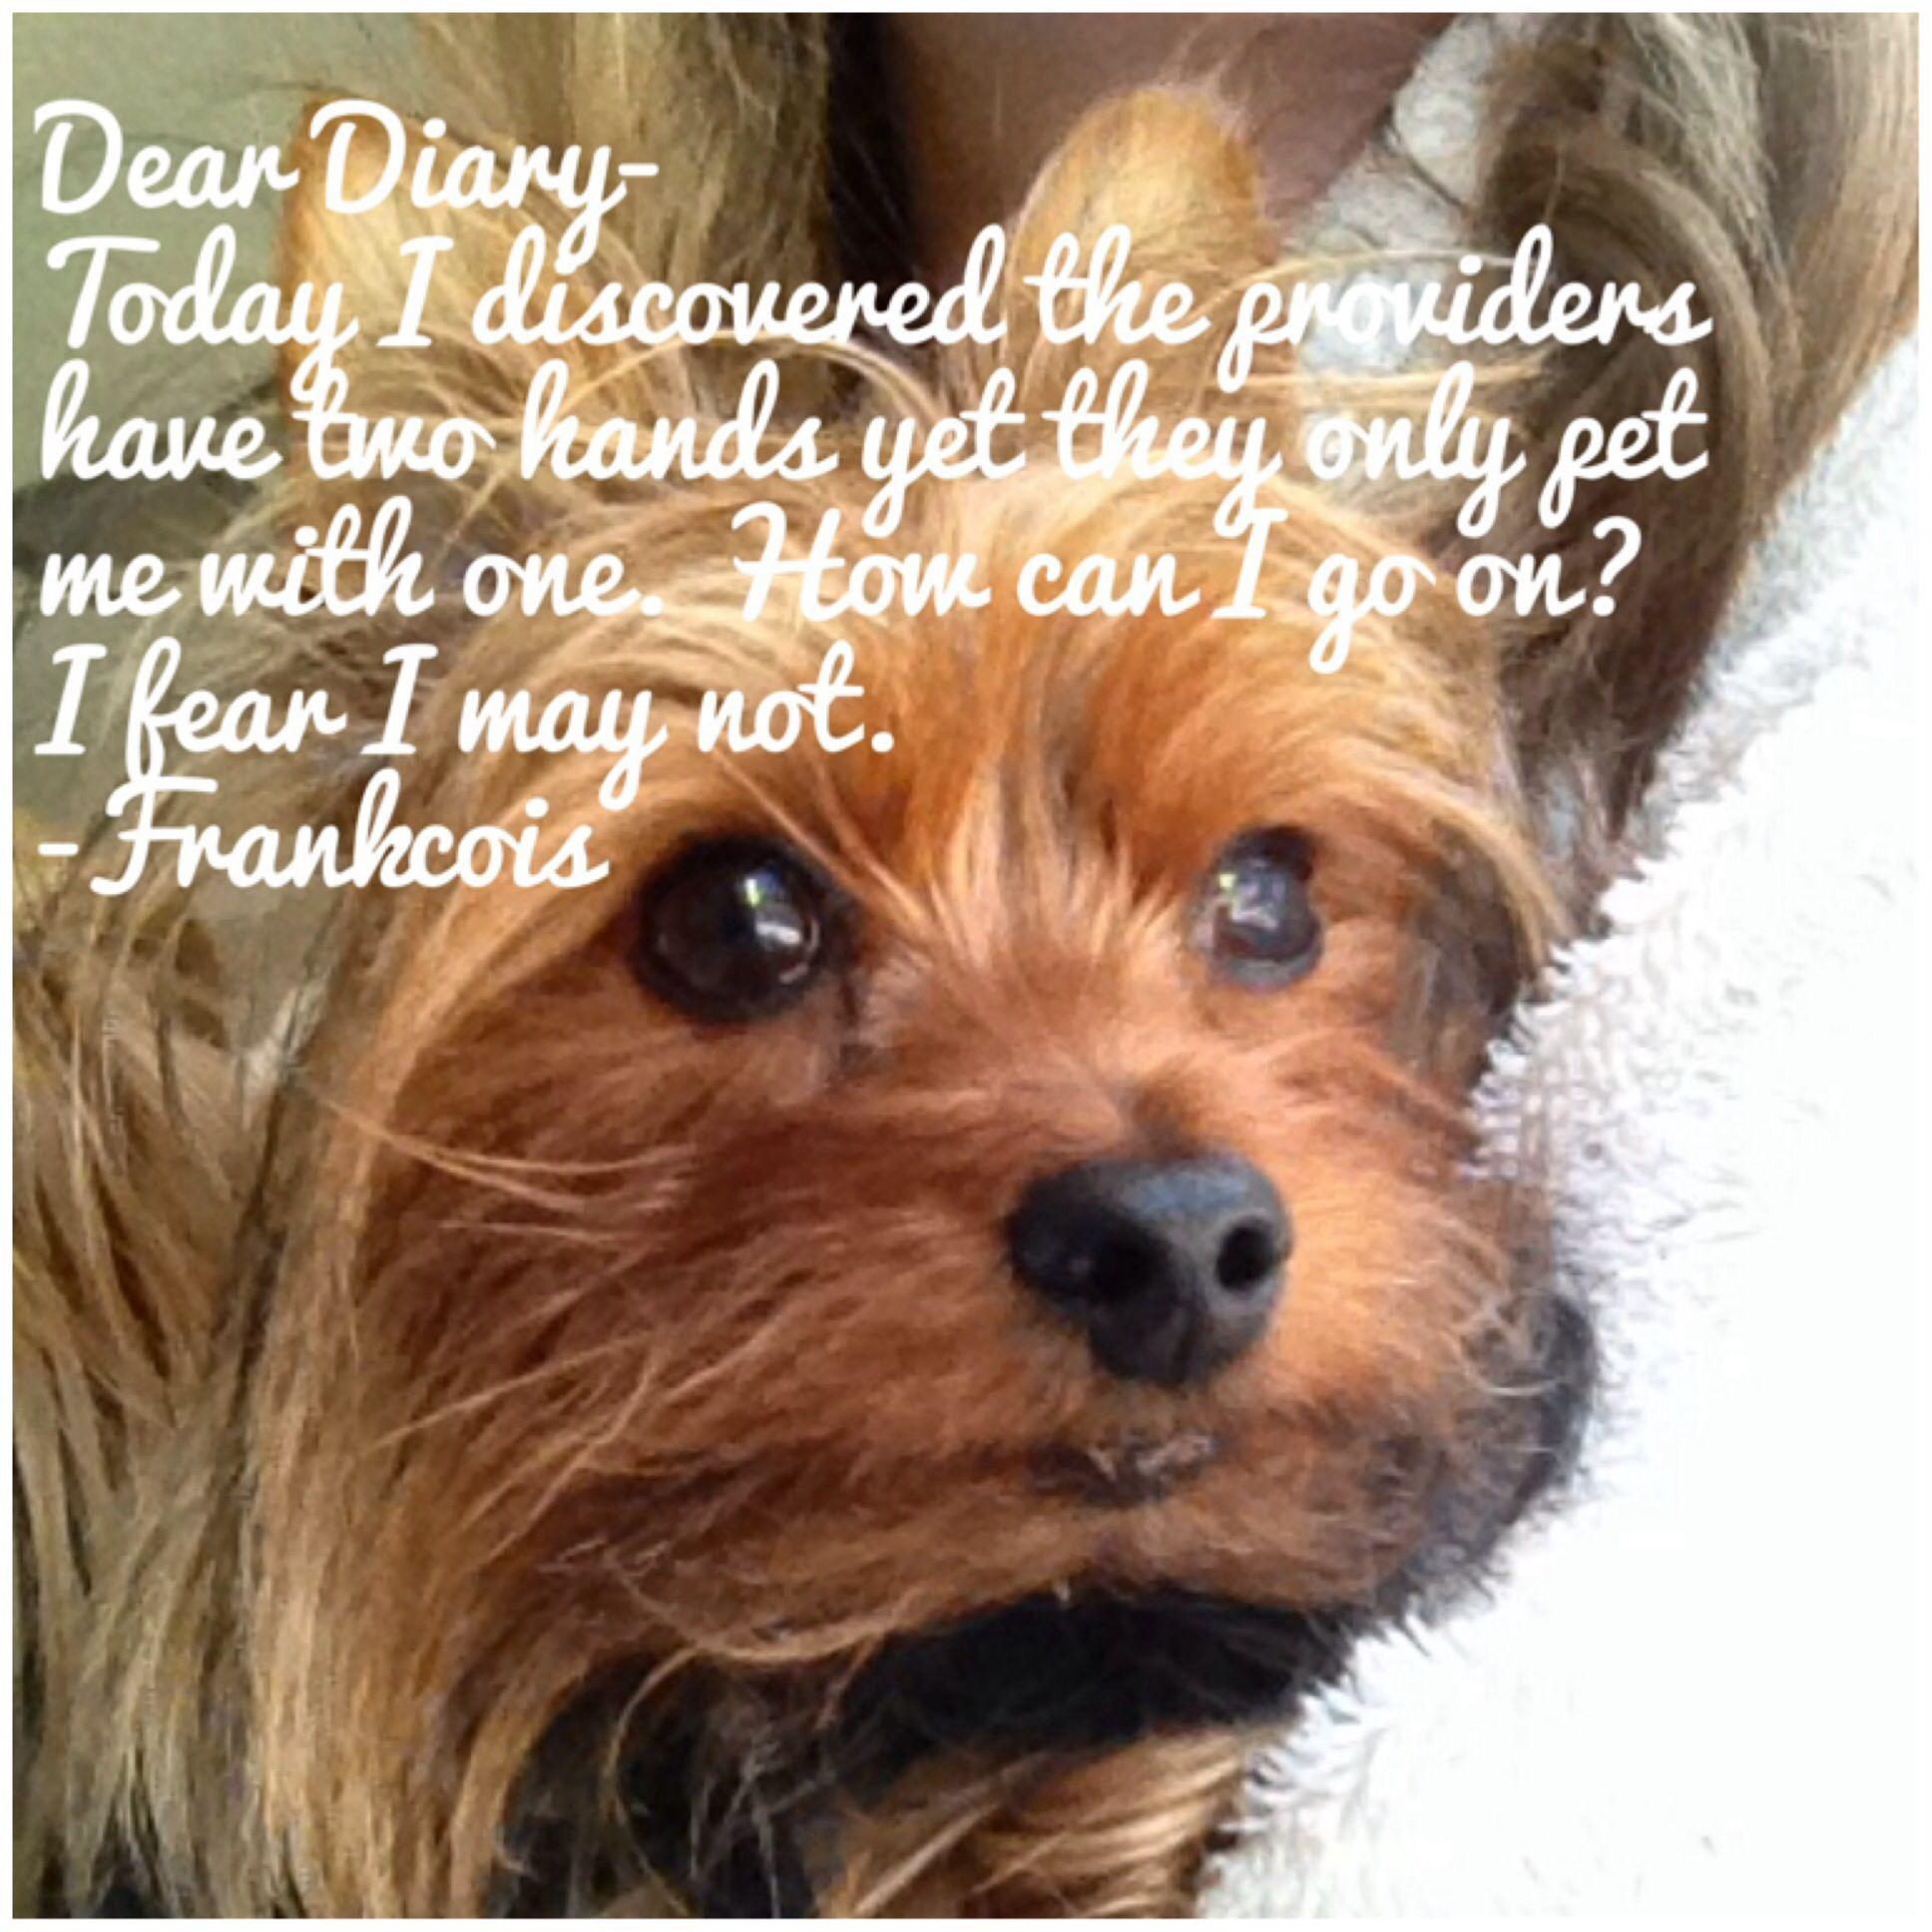 Frankcois inner thoughts. Dear Diary yorkie style. Dog meme.